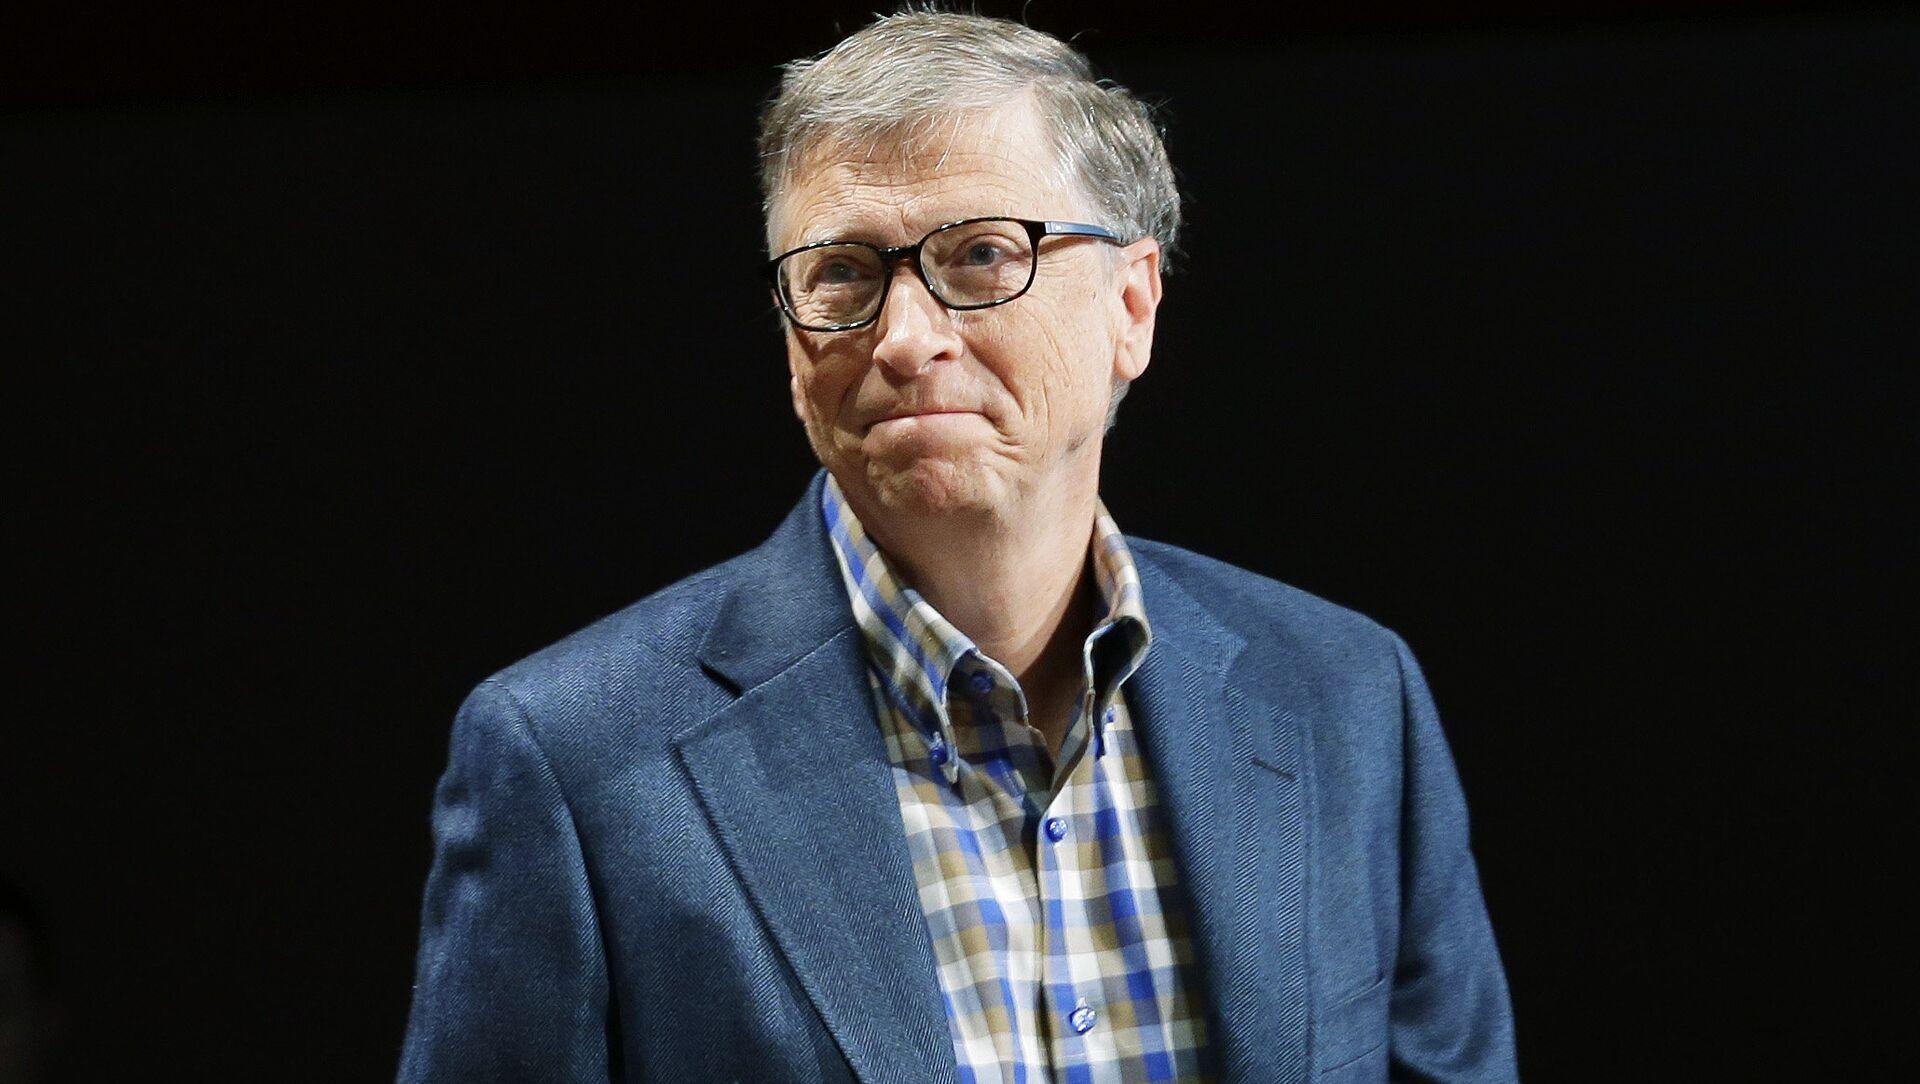 Bill Gates, cofundador de Microsoft  - Sputnik Mundo, 1920, 27.01.2021